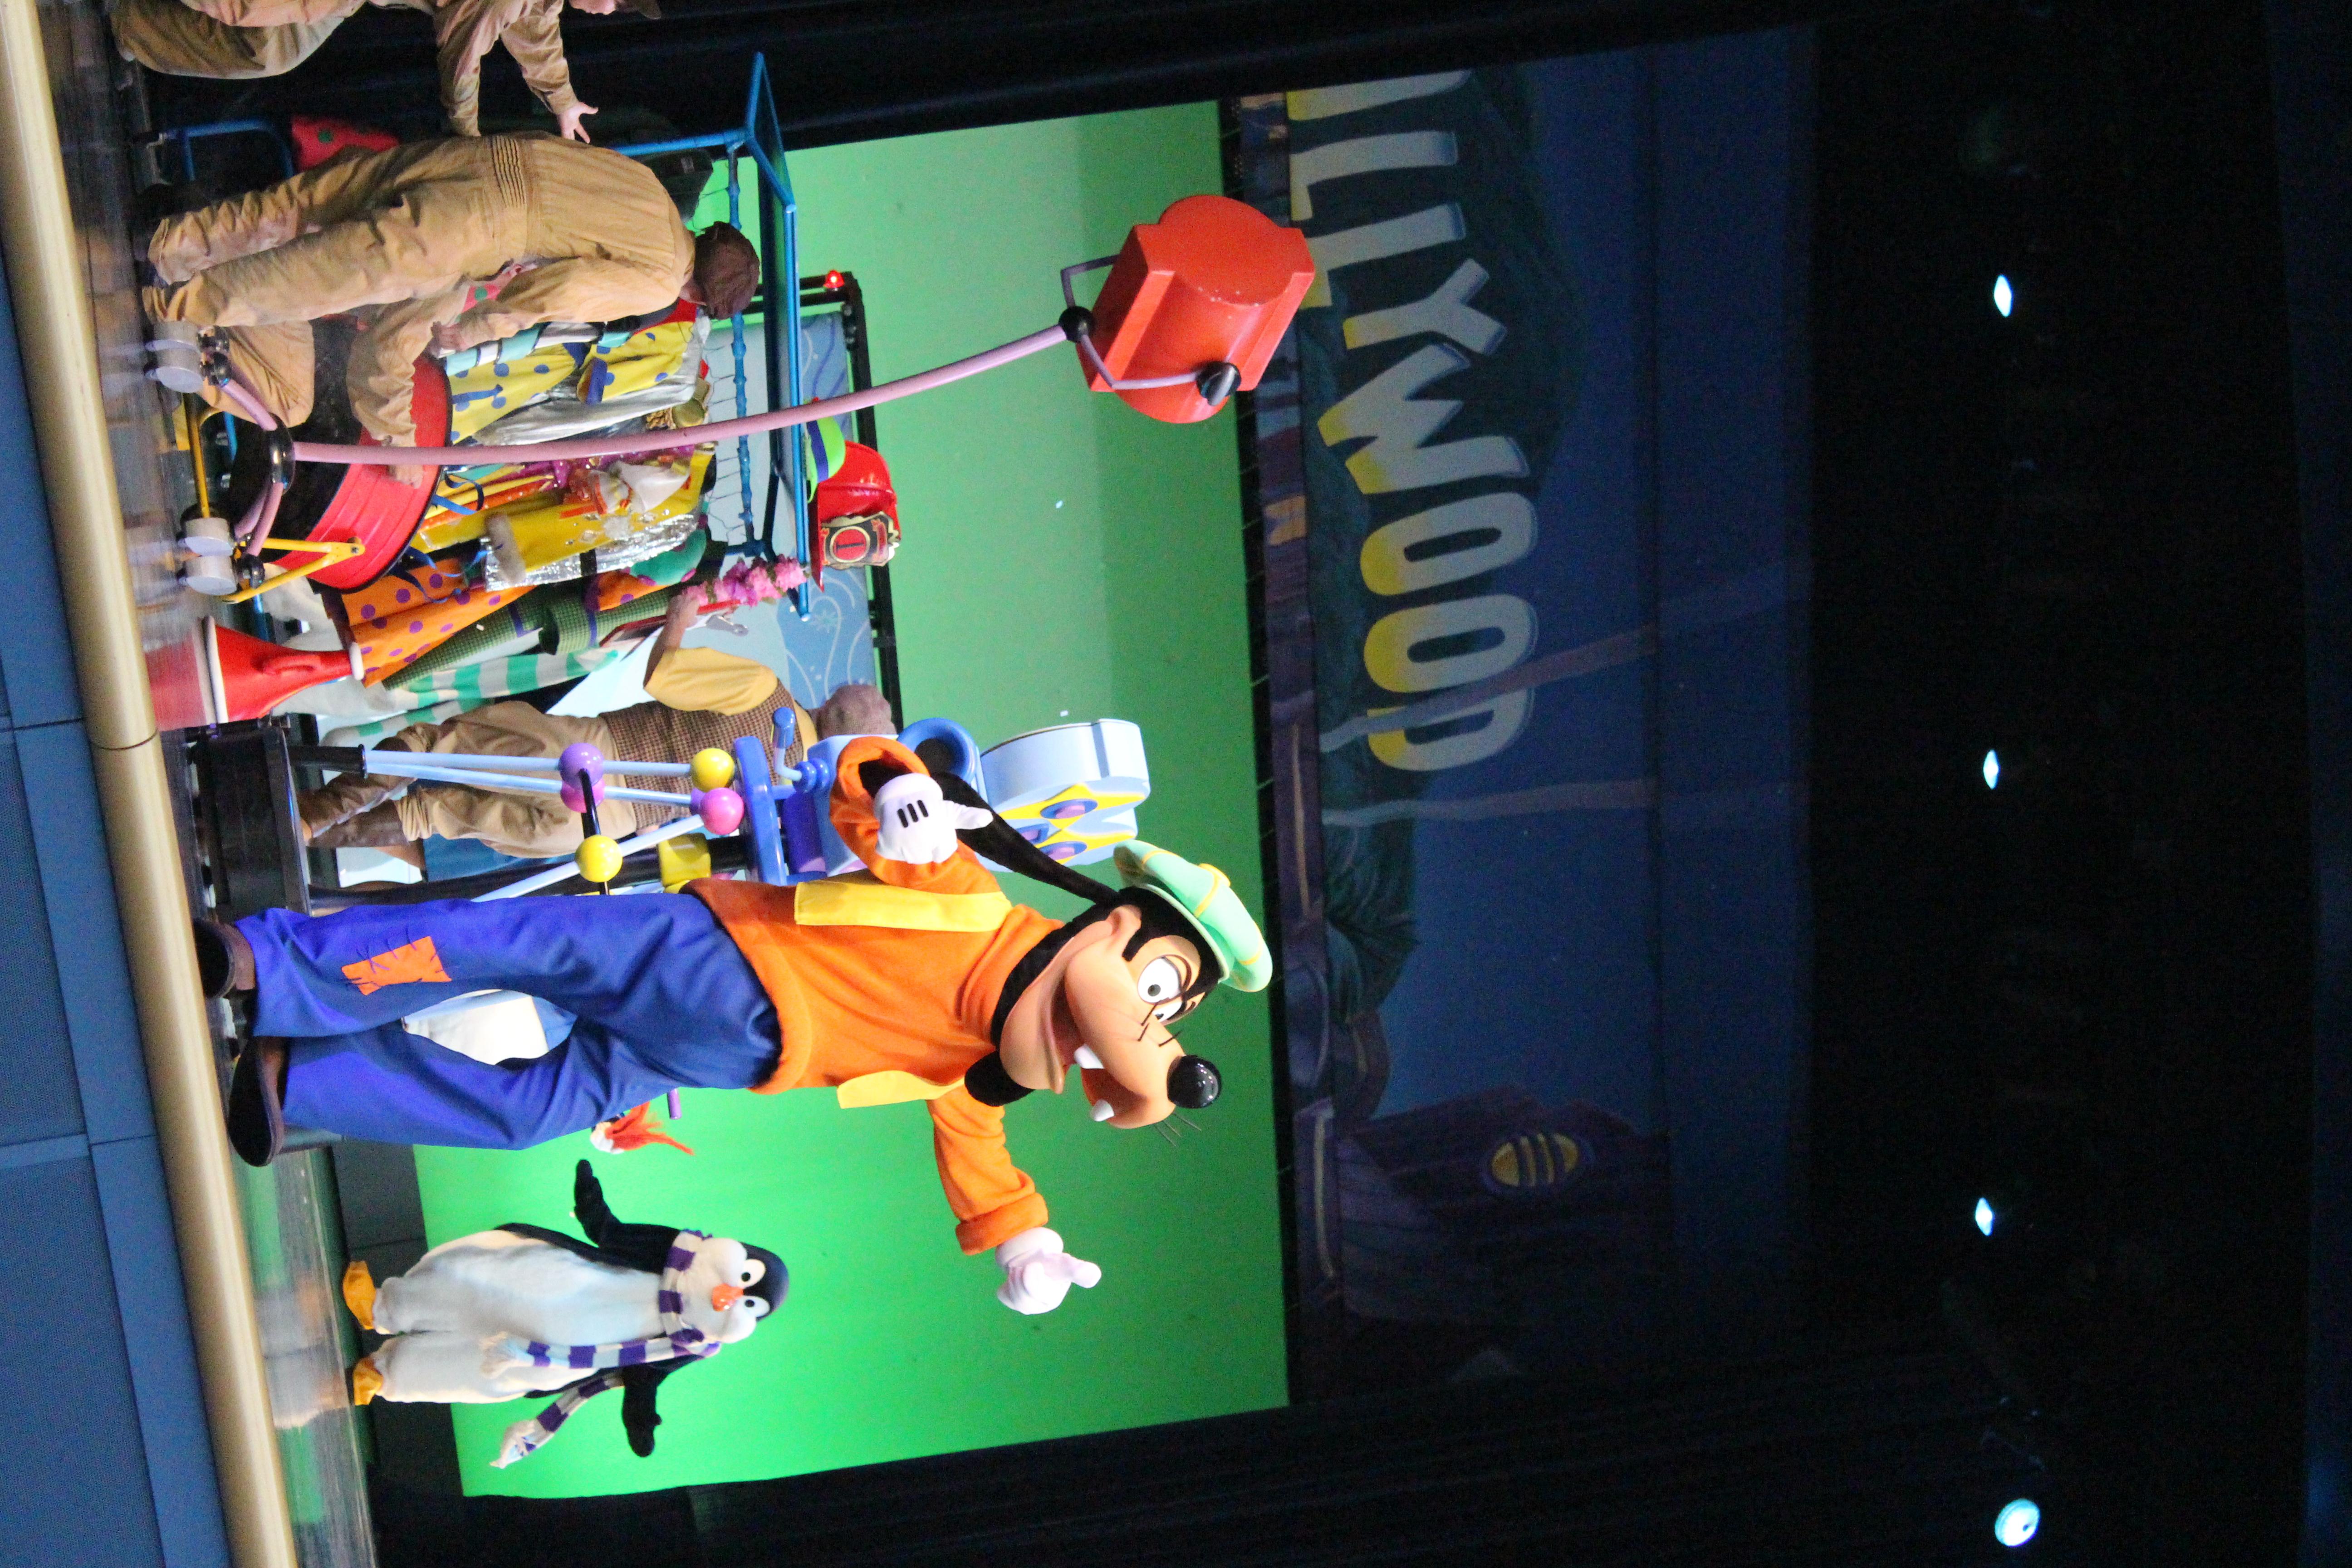 Director Goofy